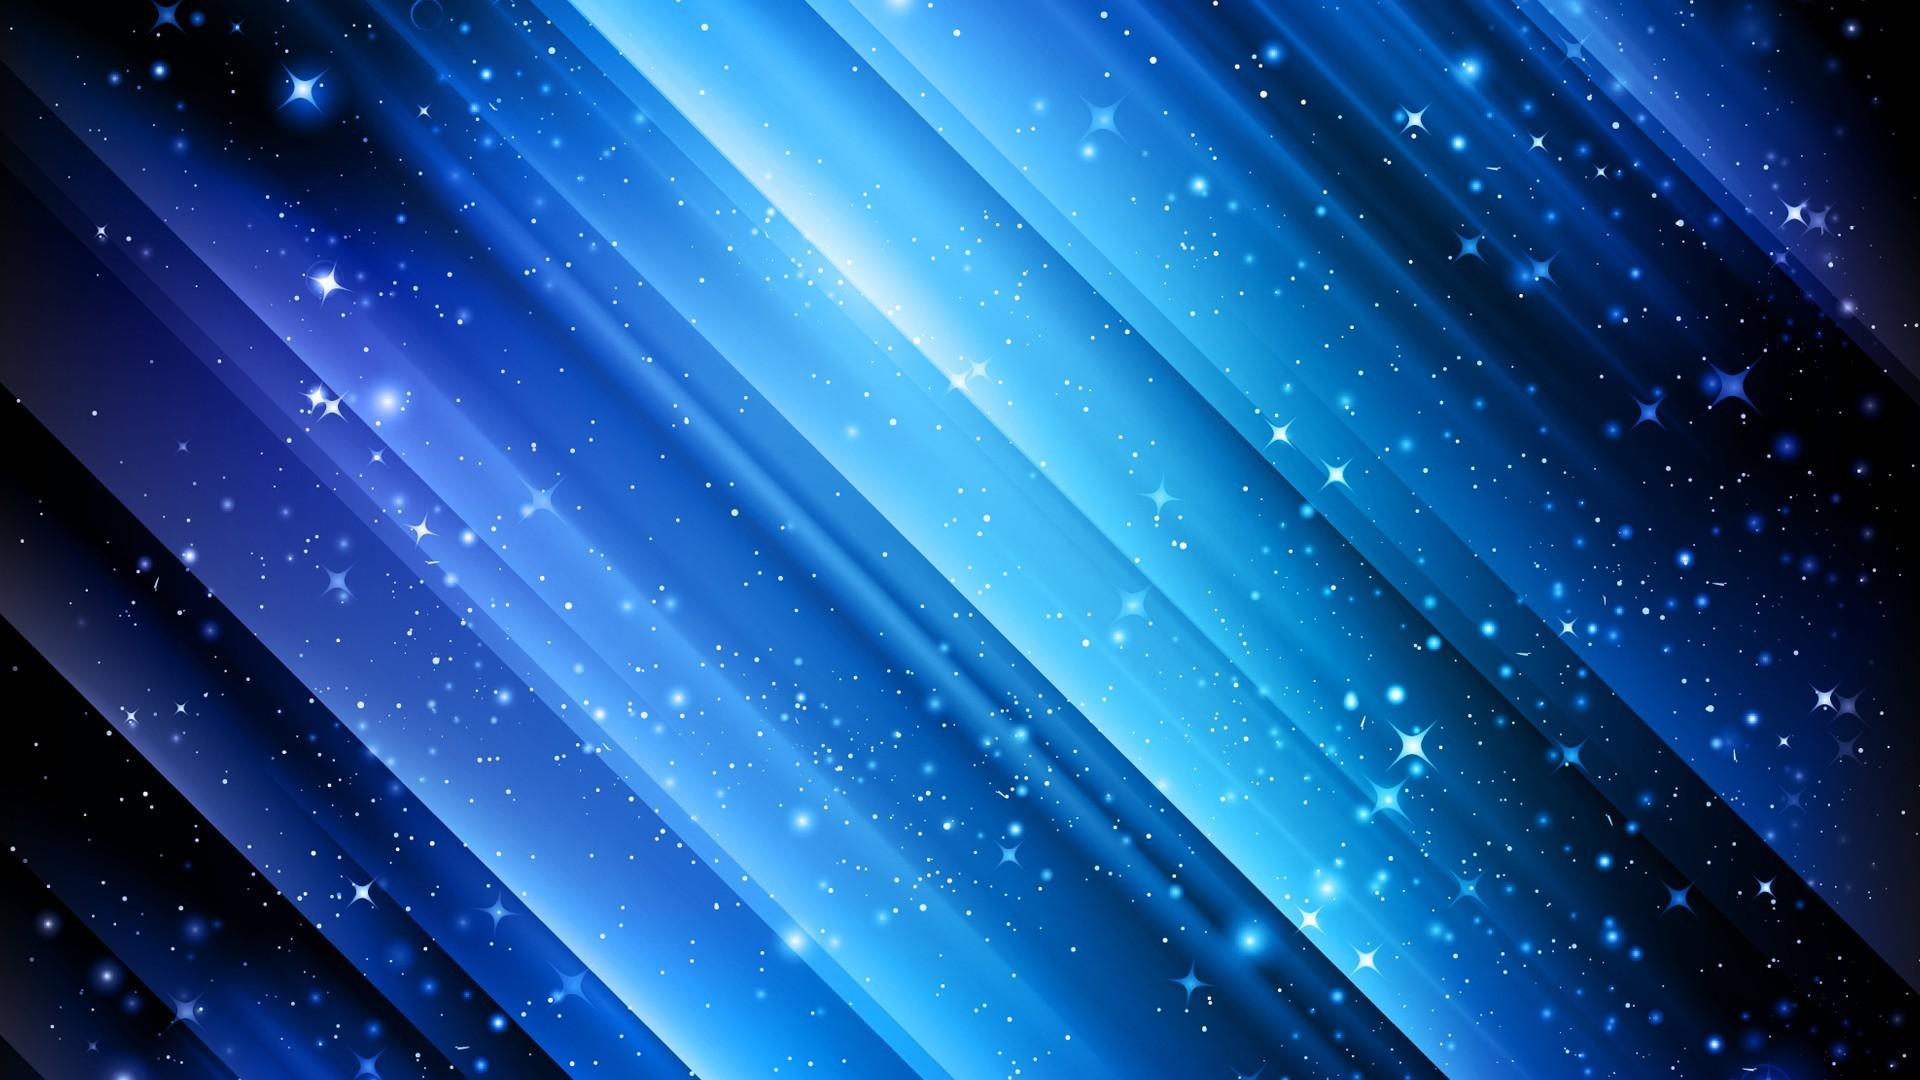 abstract blue winter snow stars vectors lines graphics wallpaper .